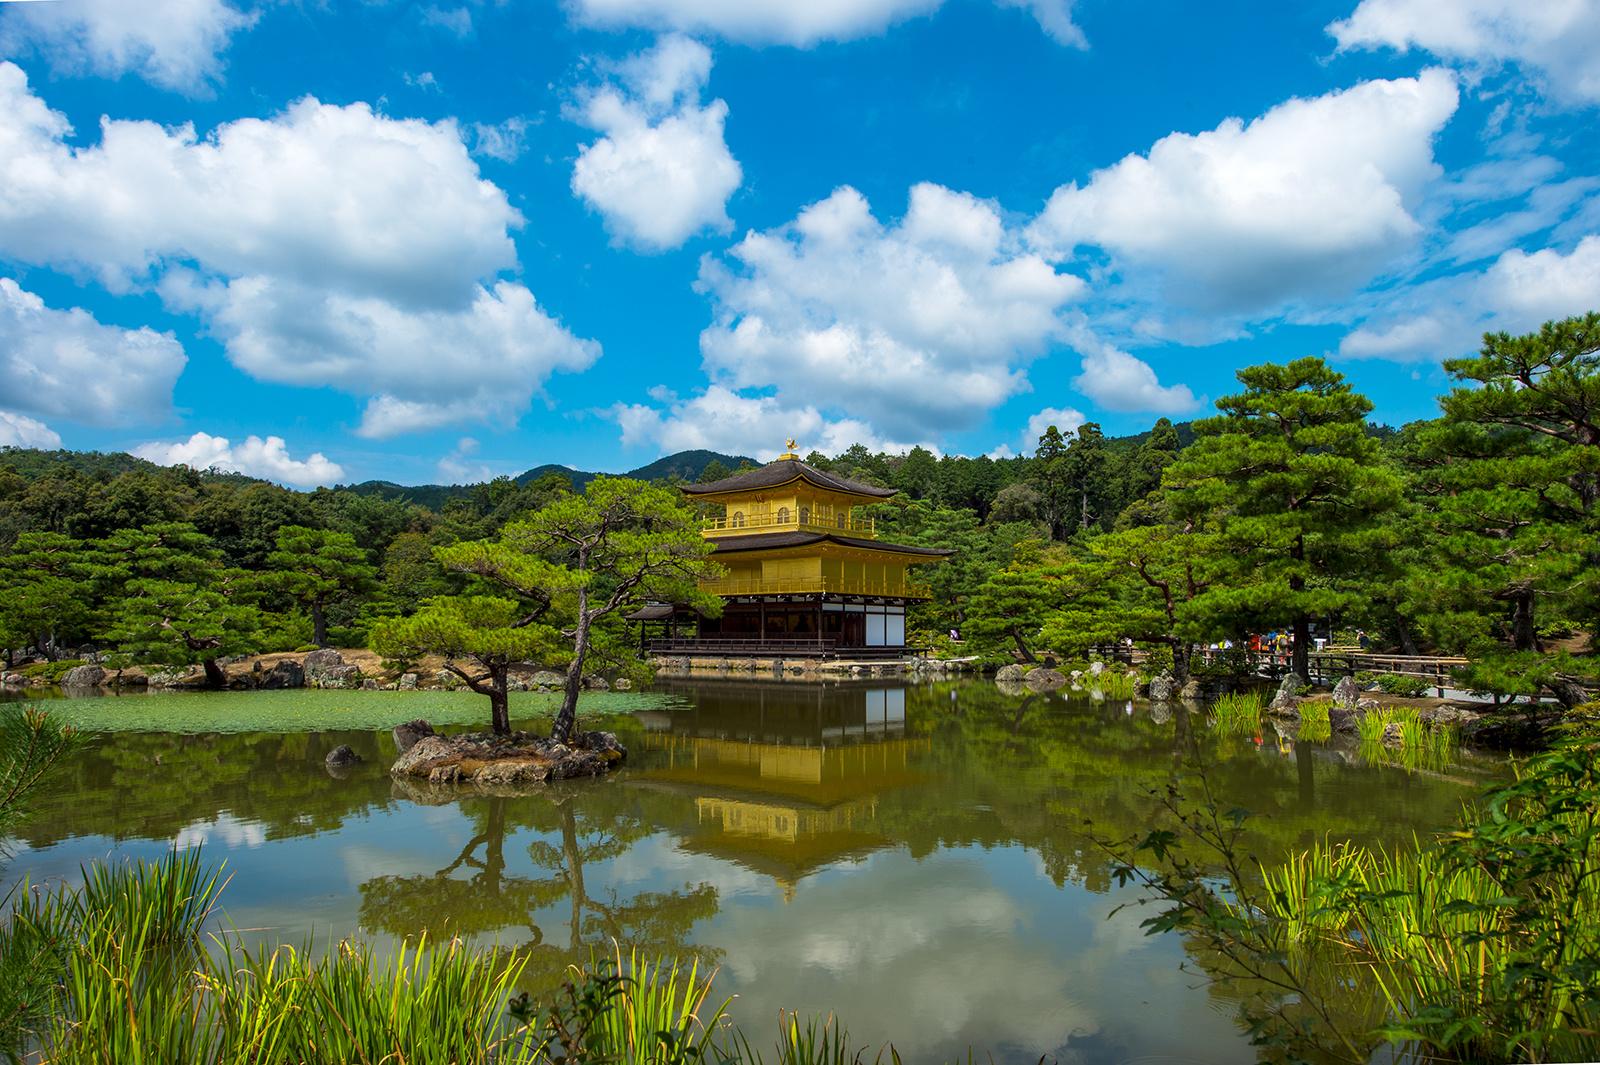 Kinkaku(The Golden Pavilion) Rokuon-ji Temple